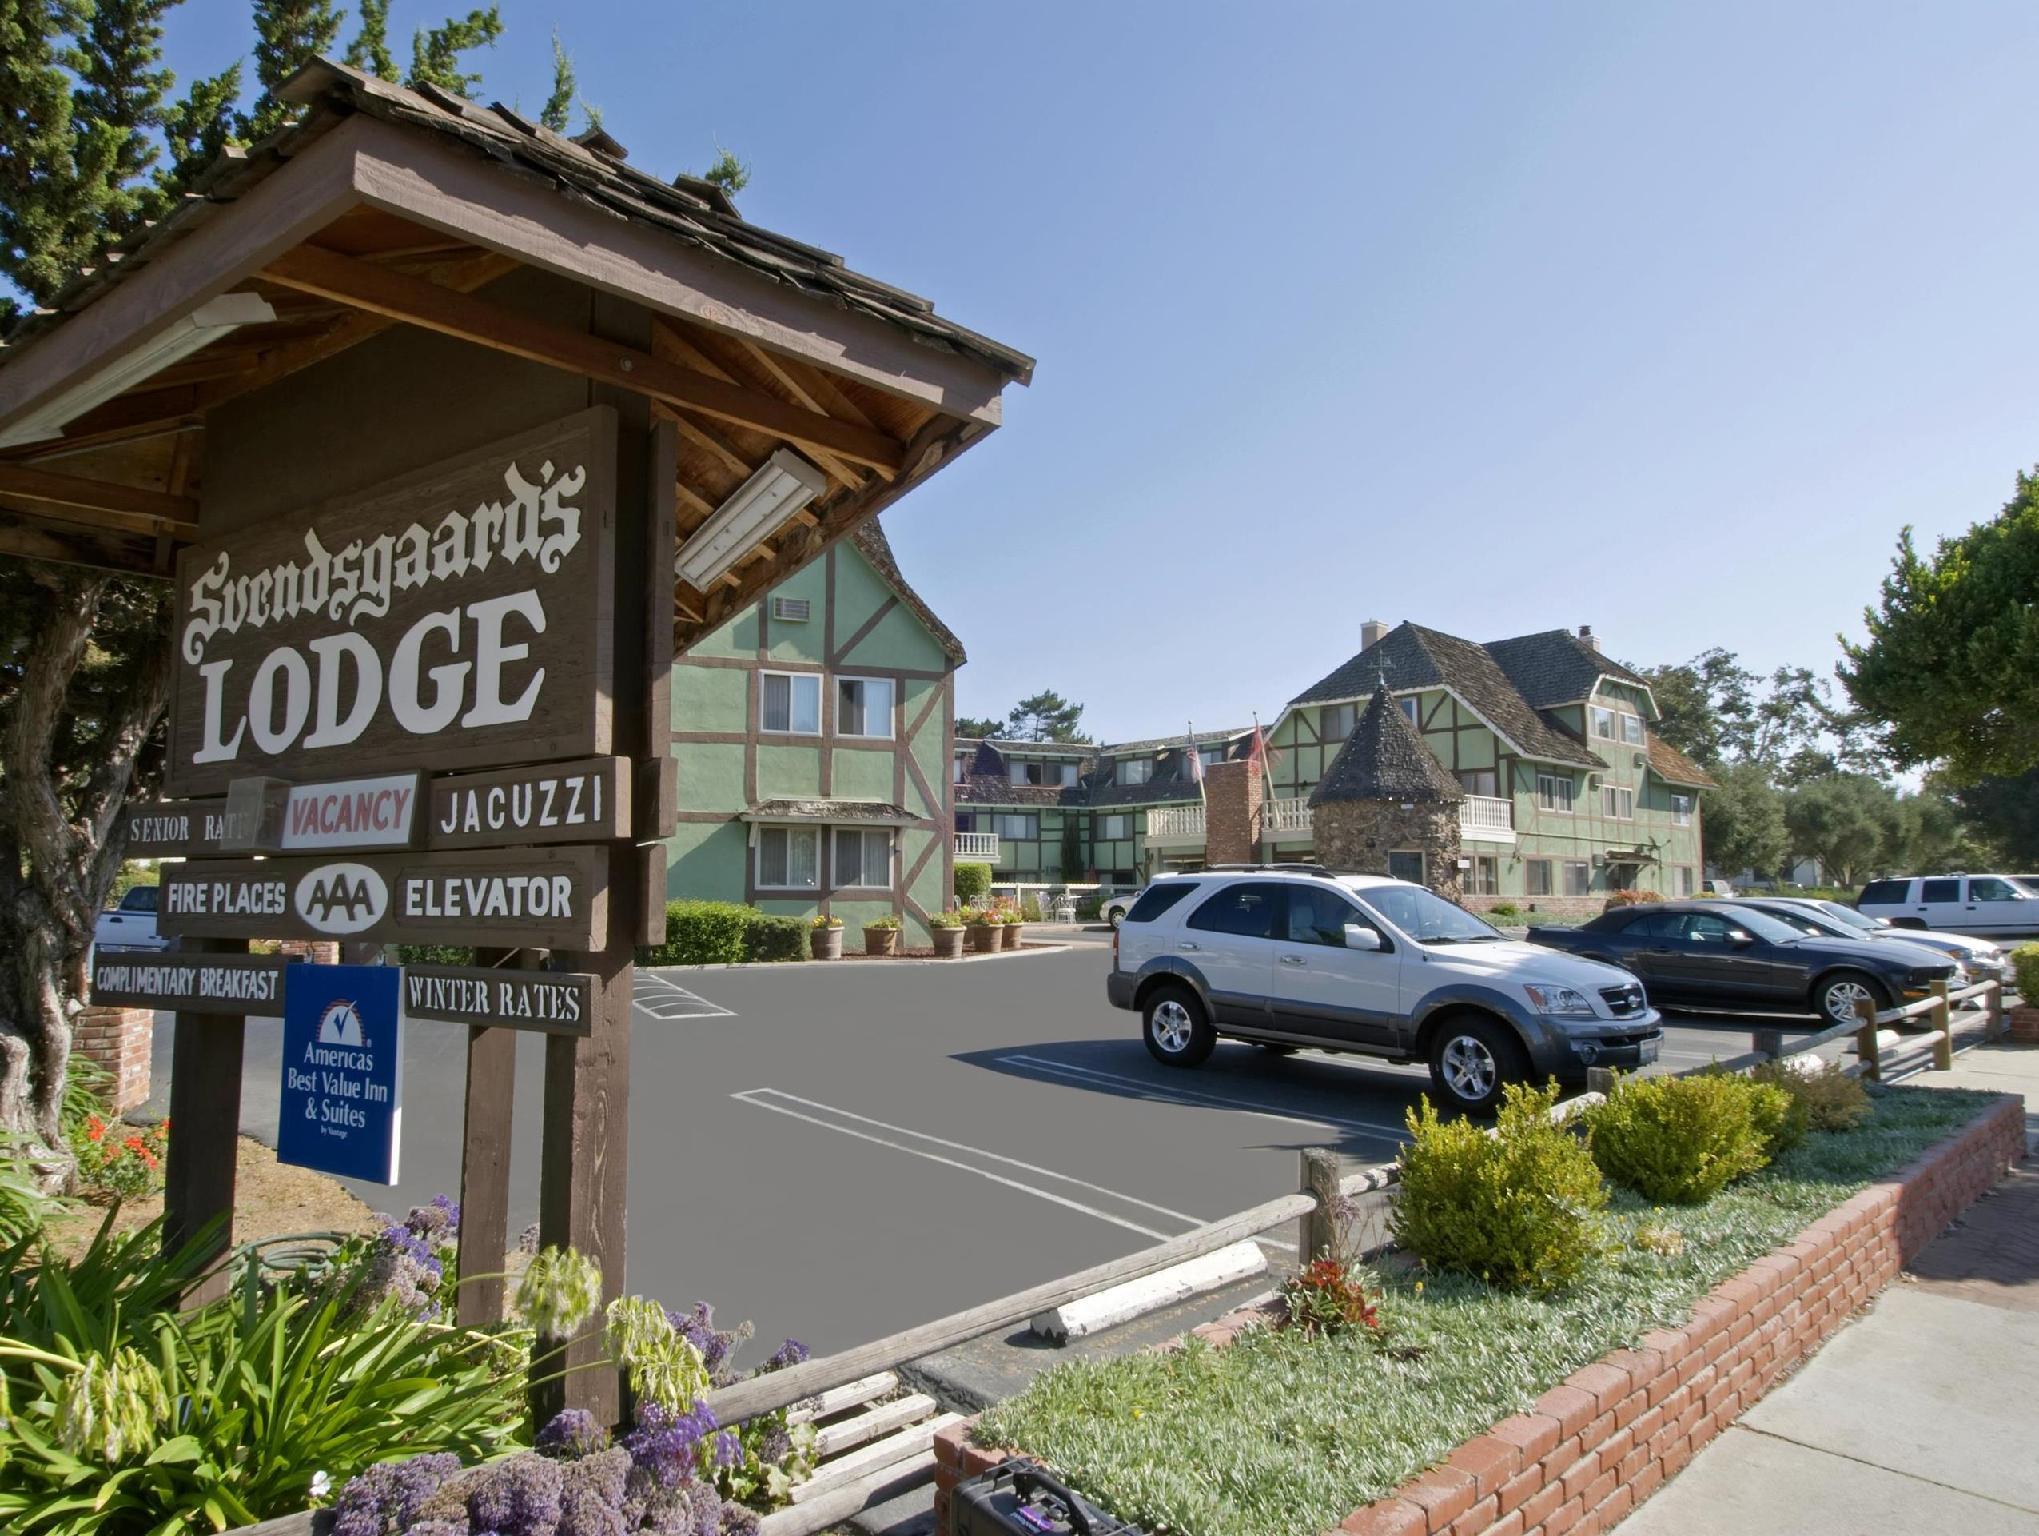 Svendsgaard's Danish Lodge Americas Best Value Inn